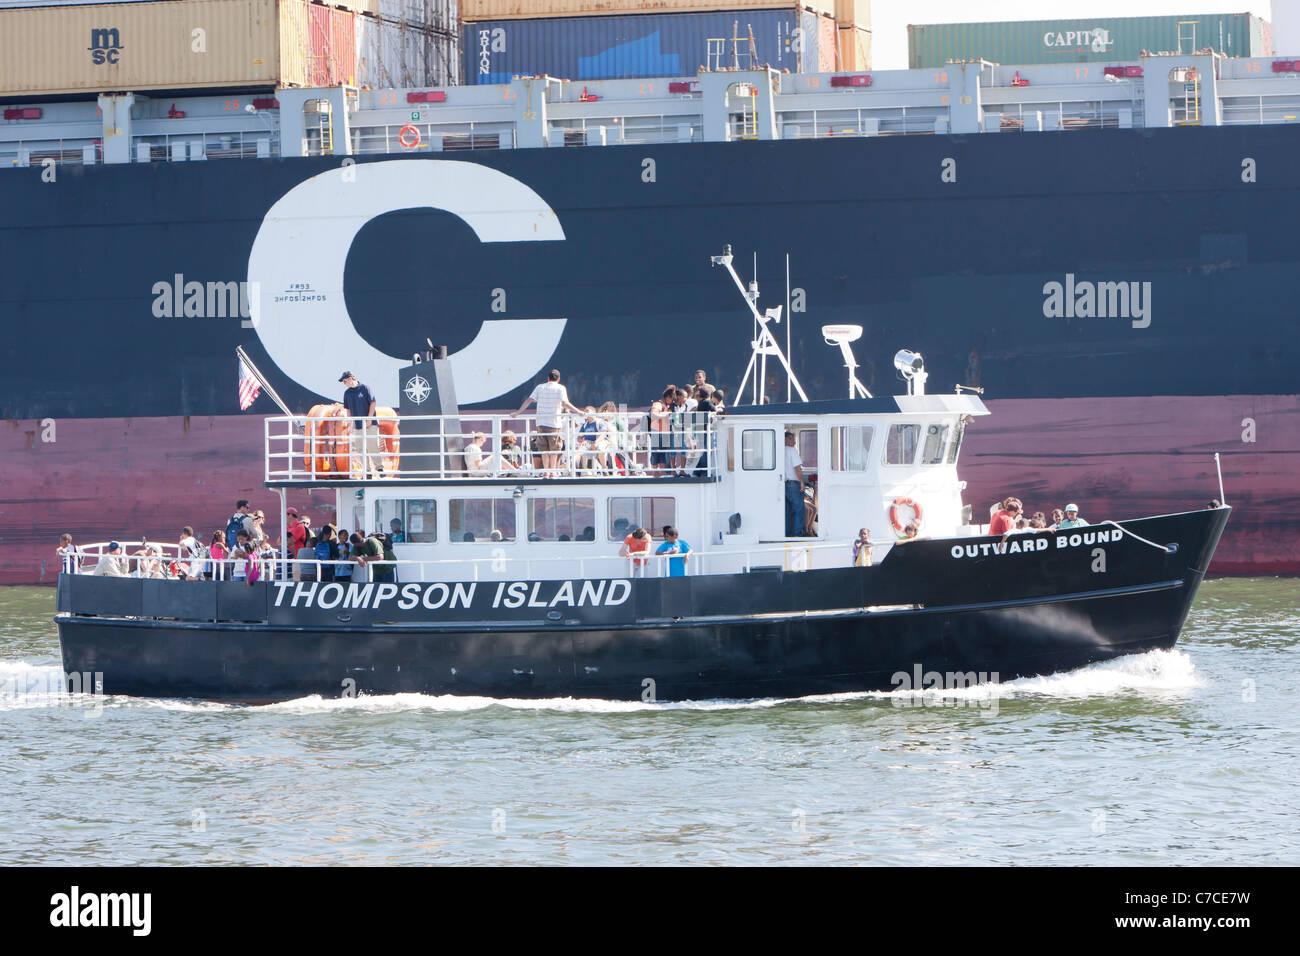 Outward Bound Thompson Island Ferry regresar a Boston, Massachusetts. Imagen De Stock